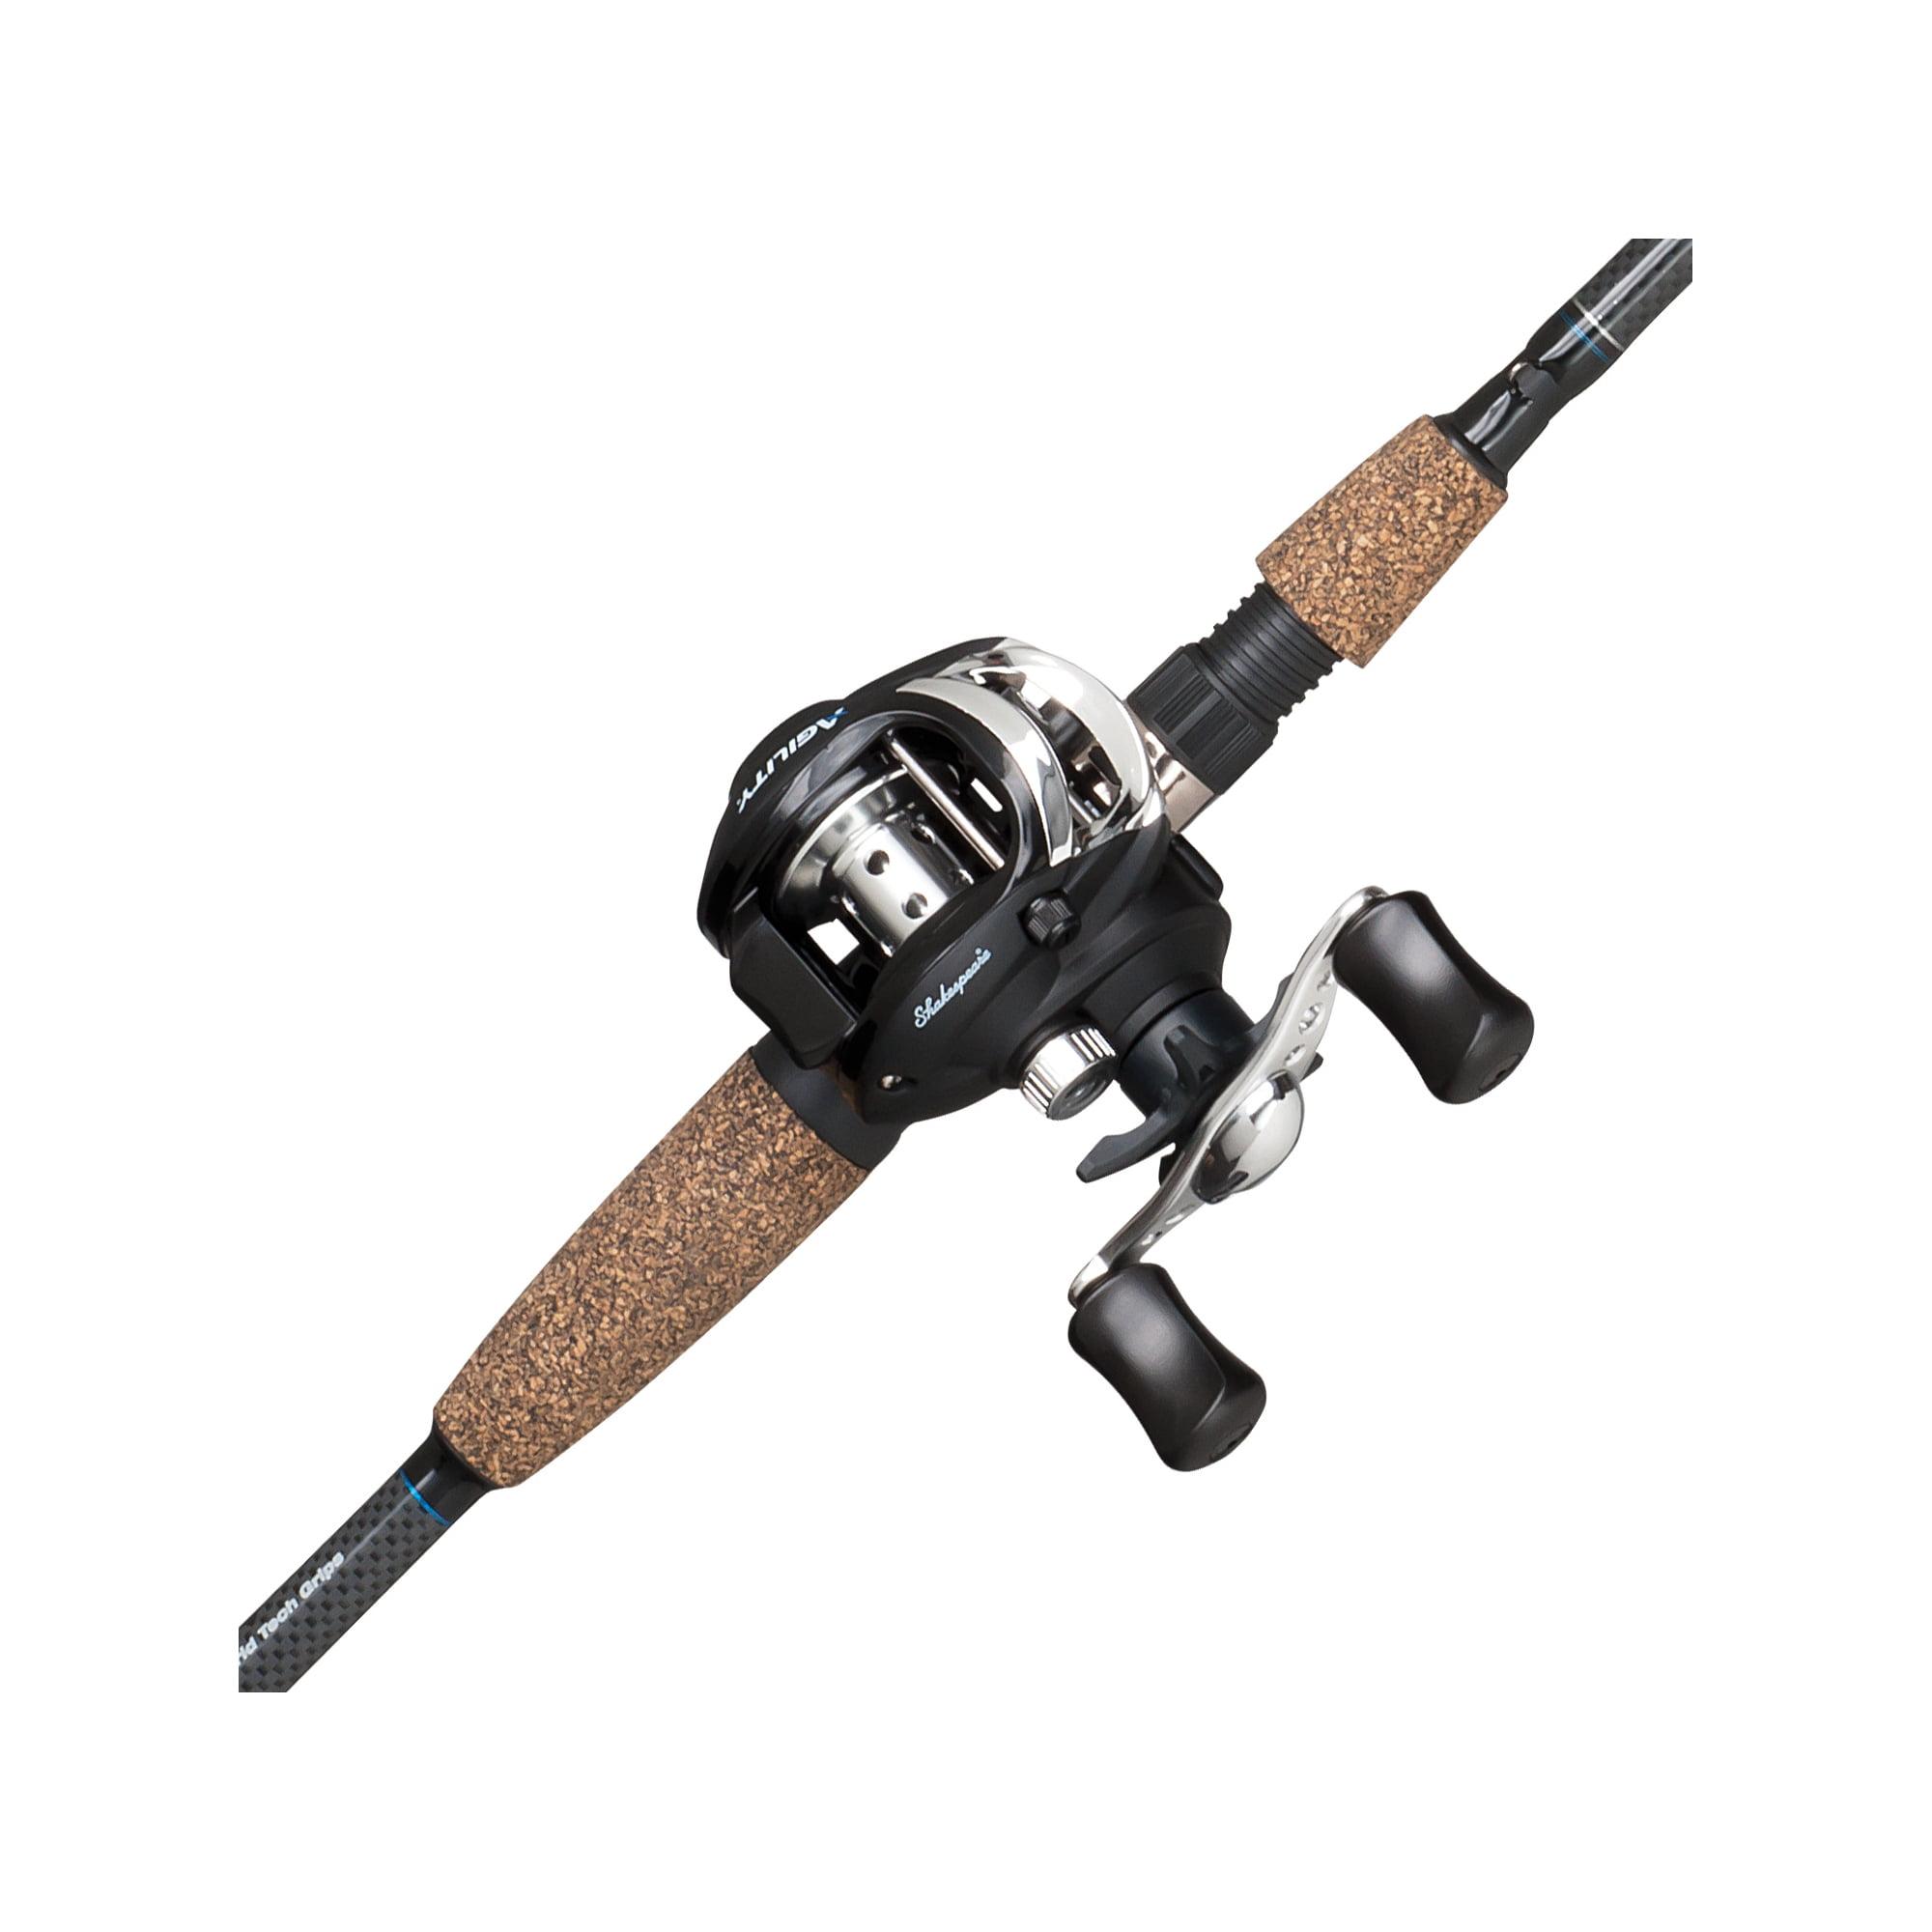 Shakespeare Agility Low Profile Baitcast Reel and Fishing Rod Combo